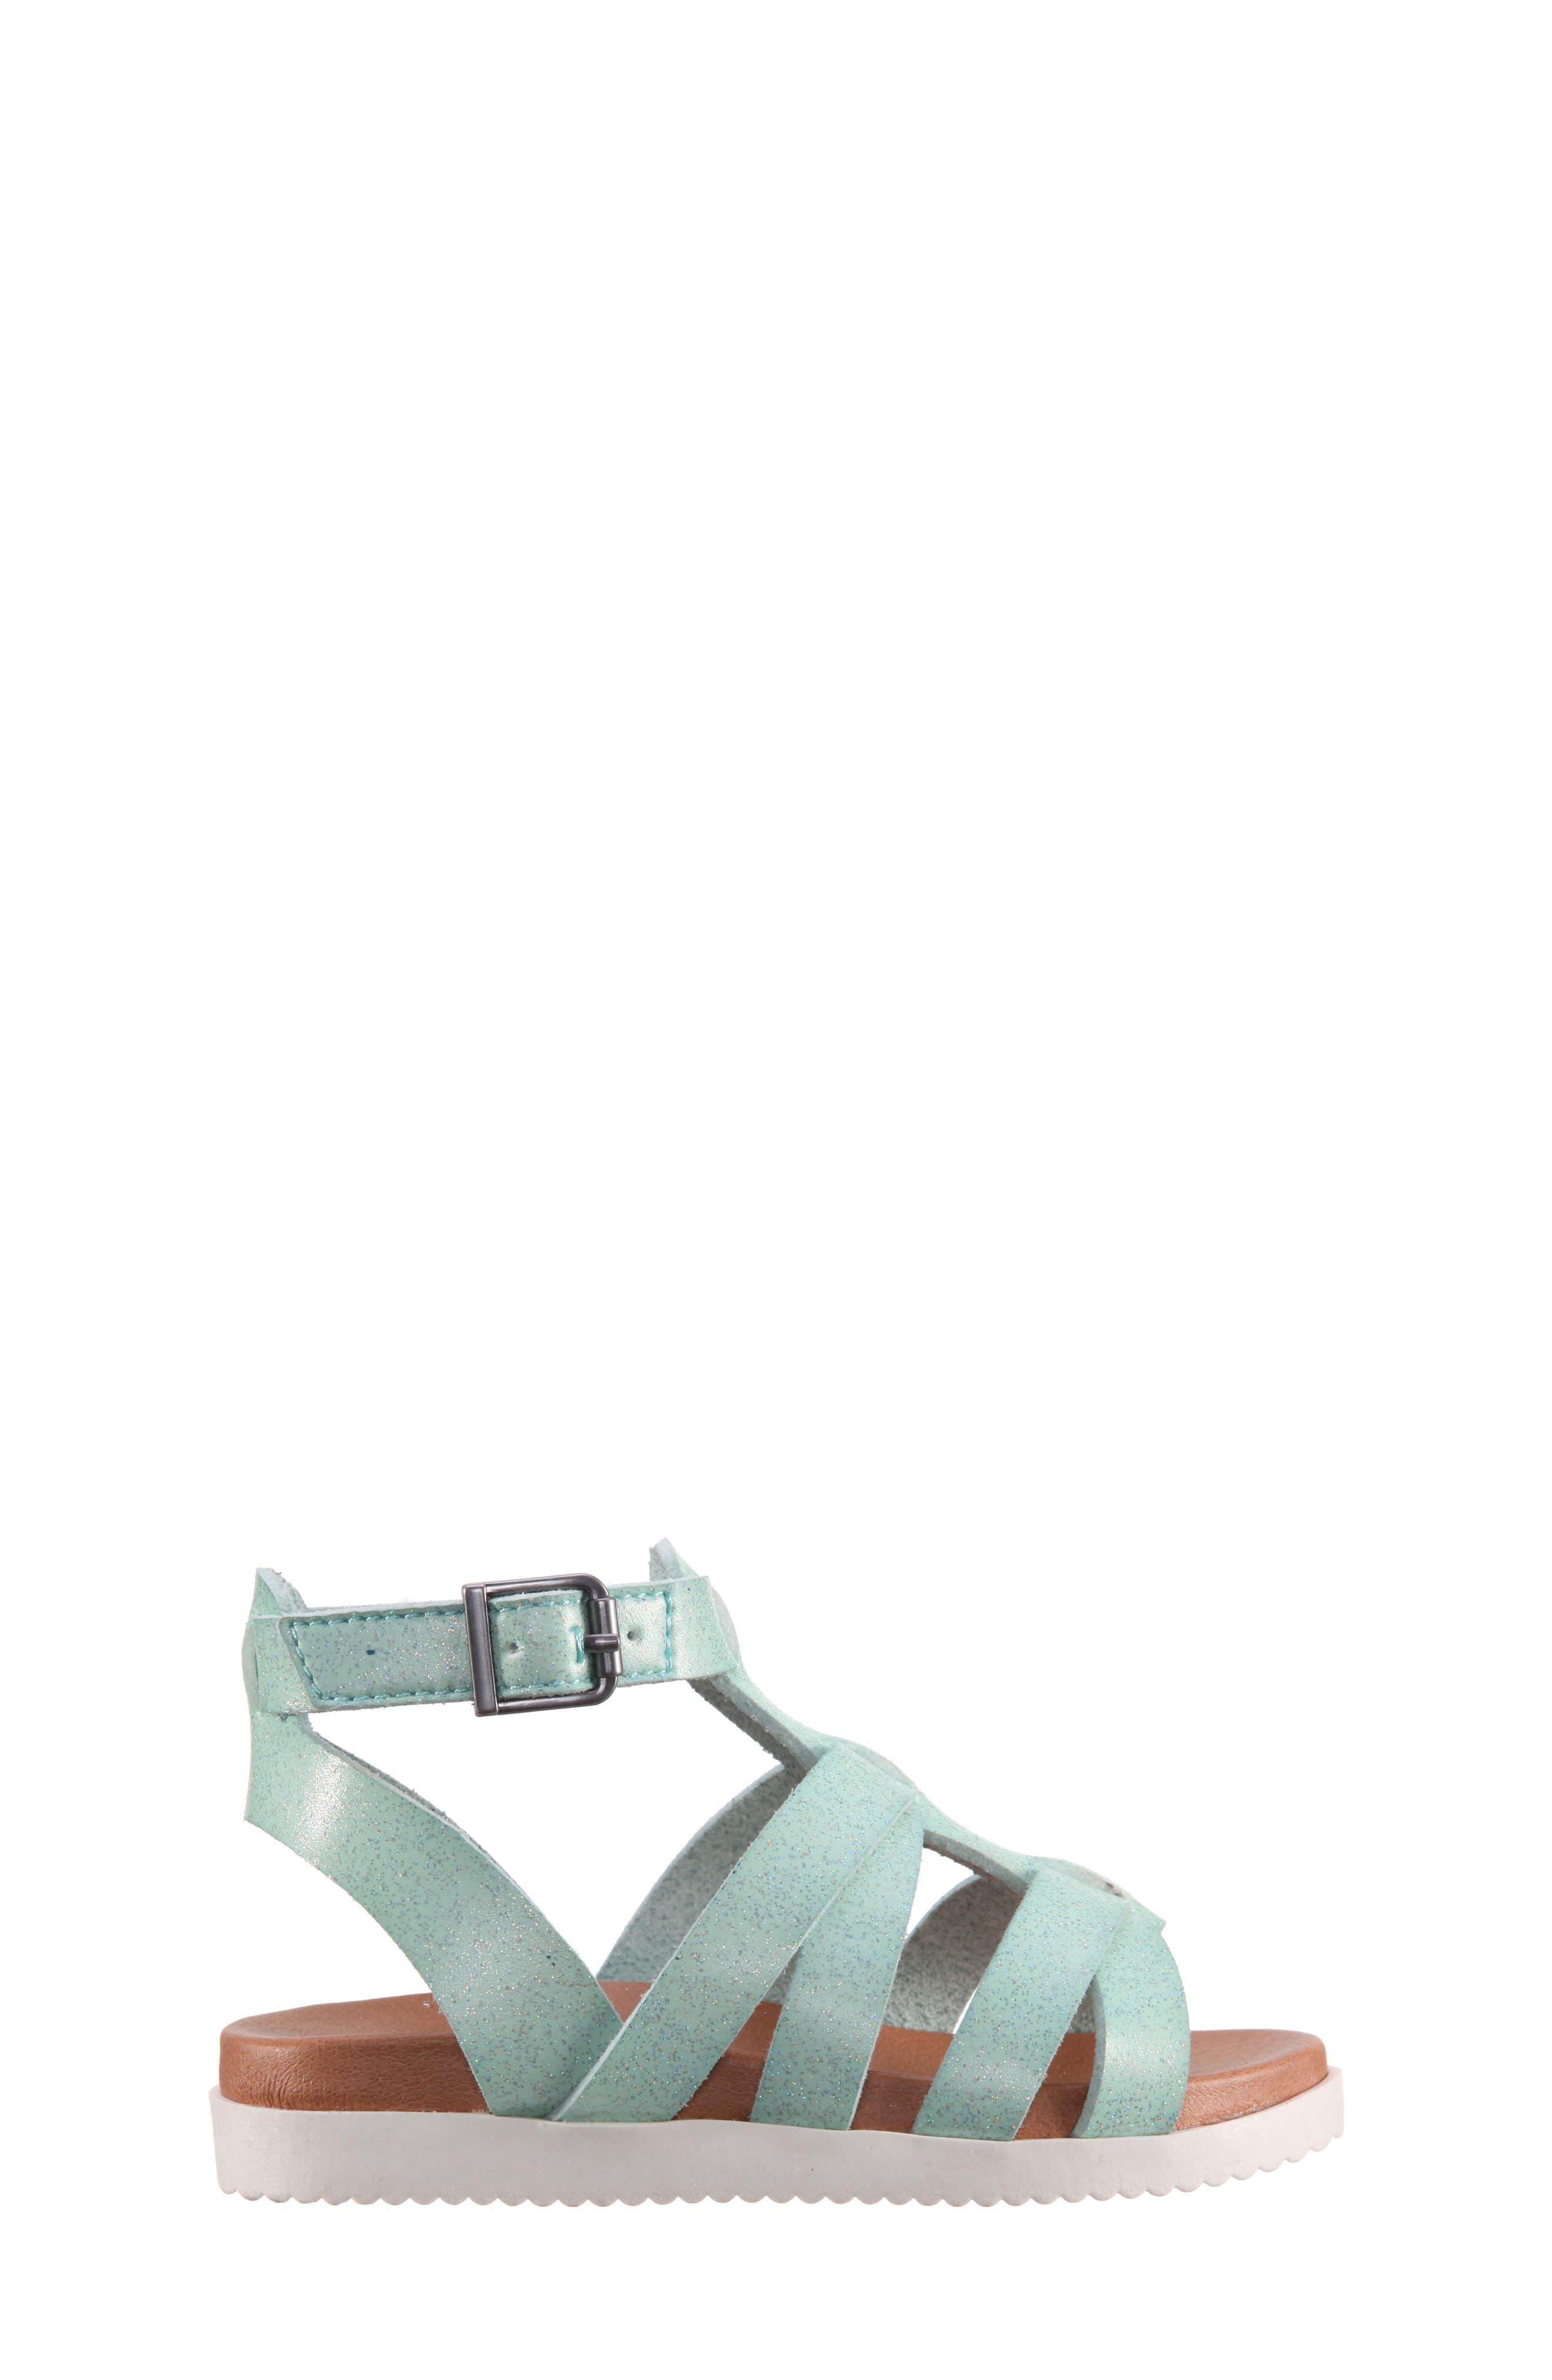 Alpha Gladiator Sandal,                             Alternate thumbnail 3, color,                             Mint Dip Dye